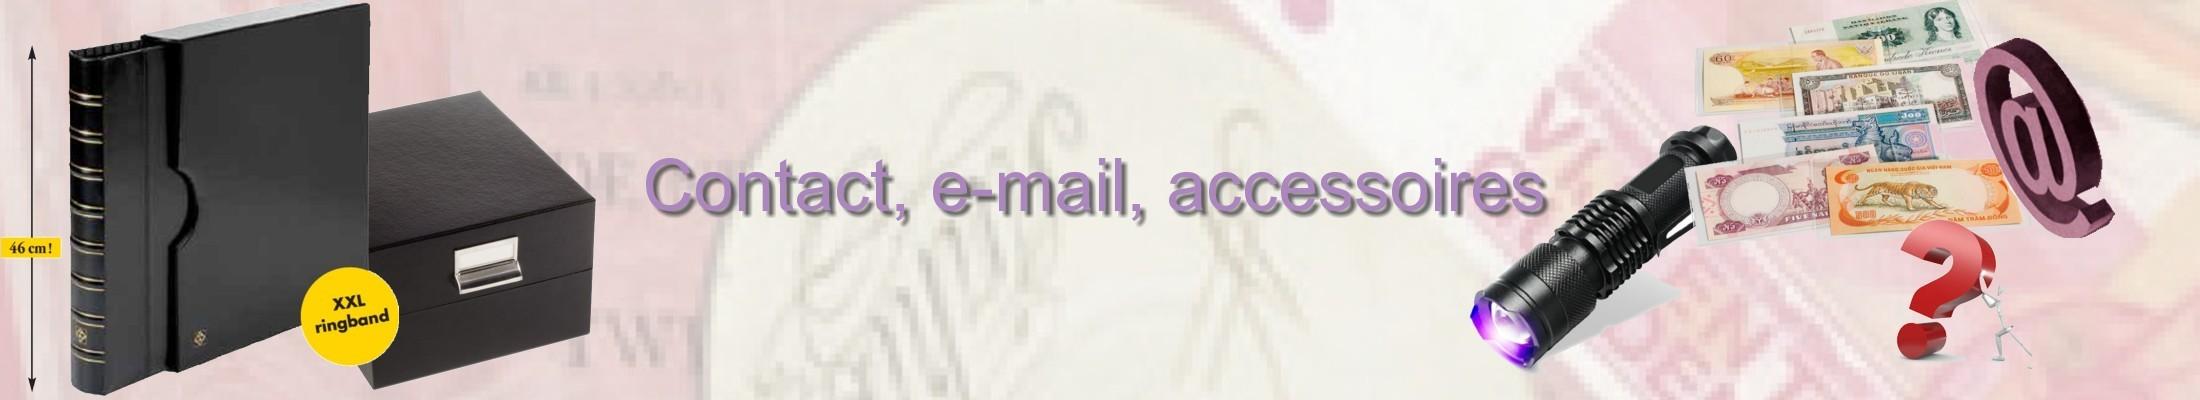 Contact, e-mail, accessoires